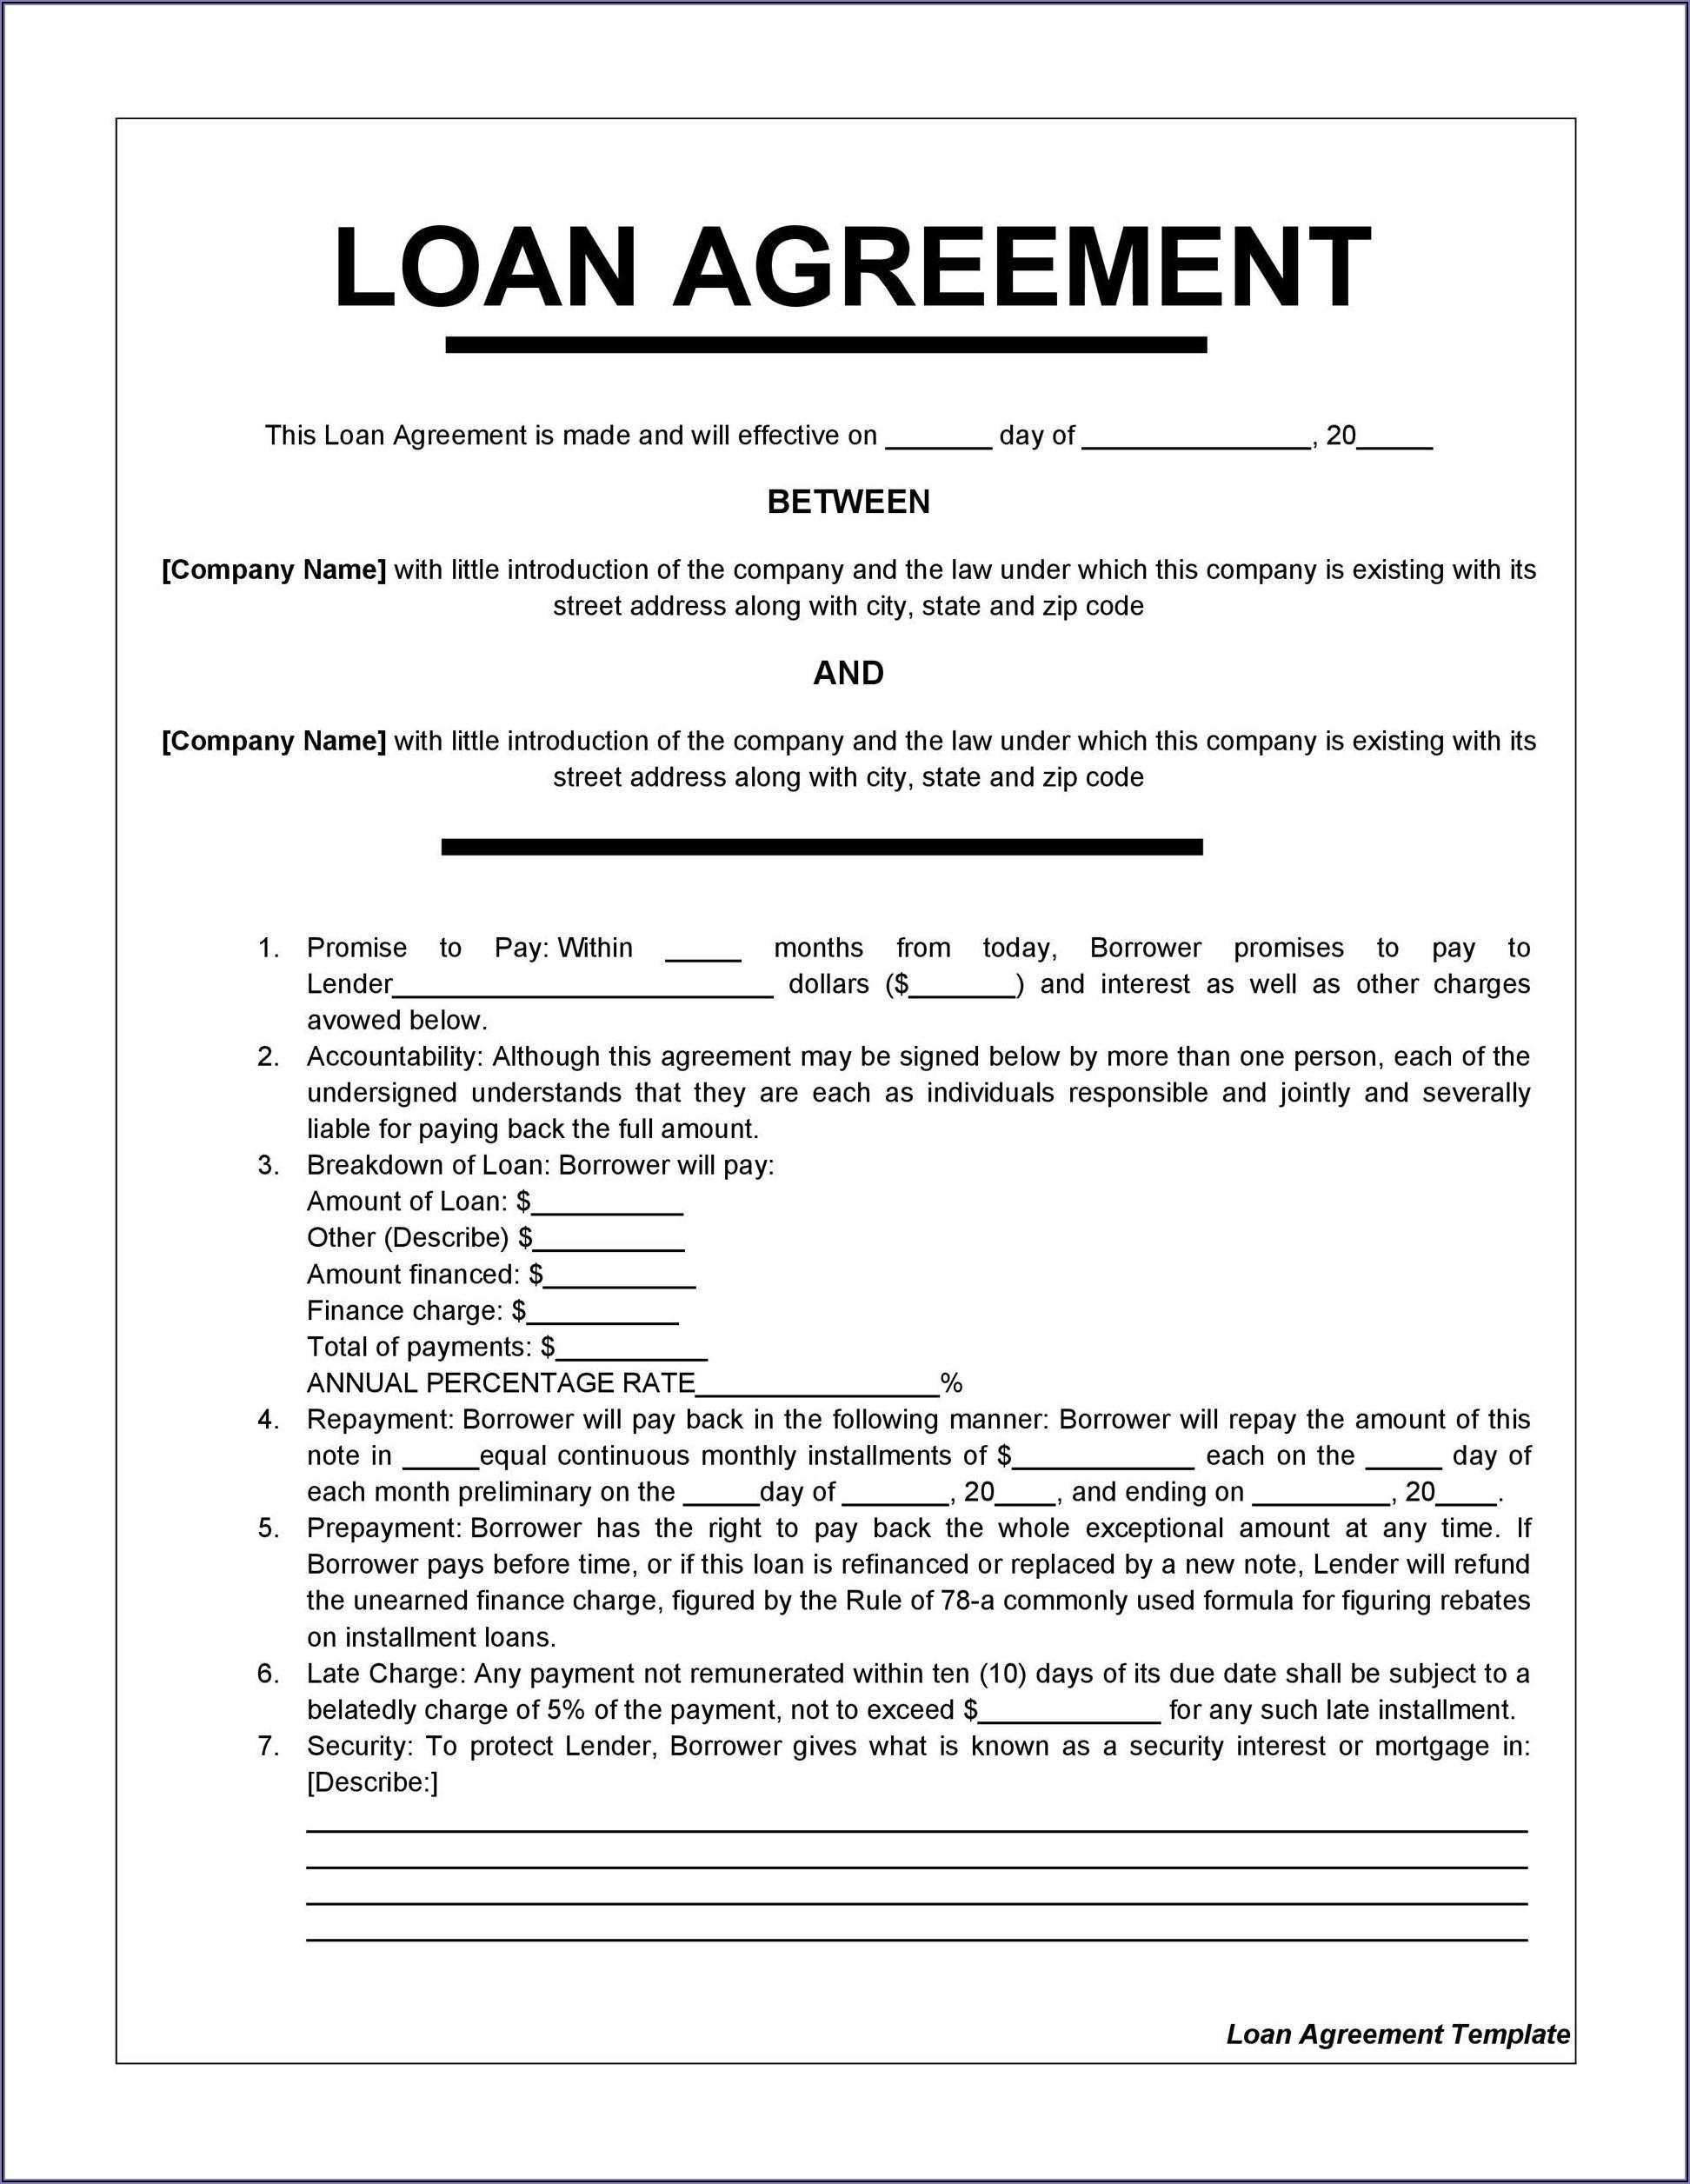 Loan Agreement Template Sample